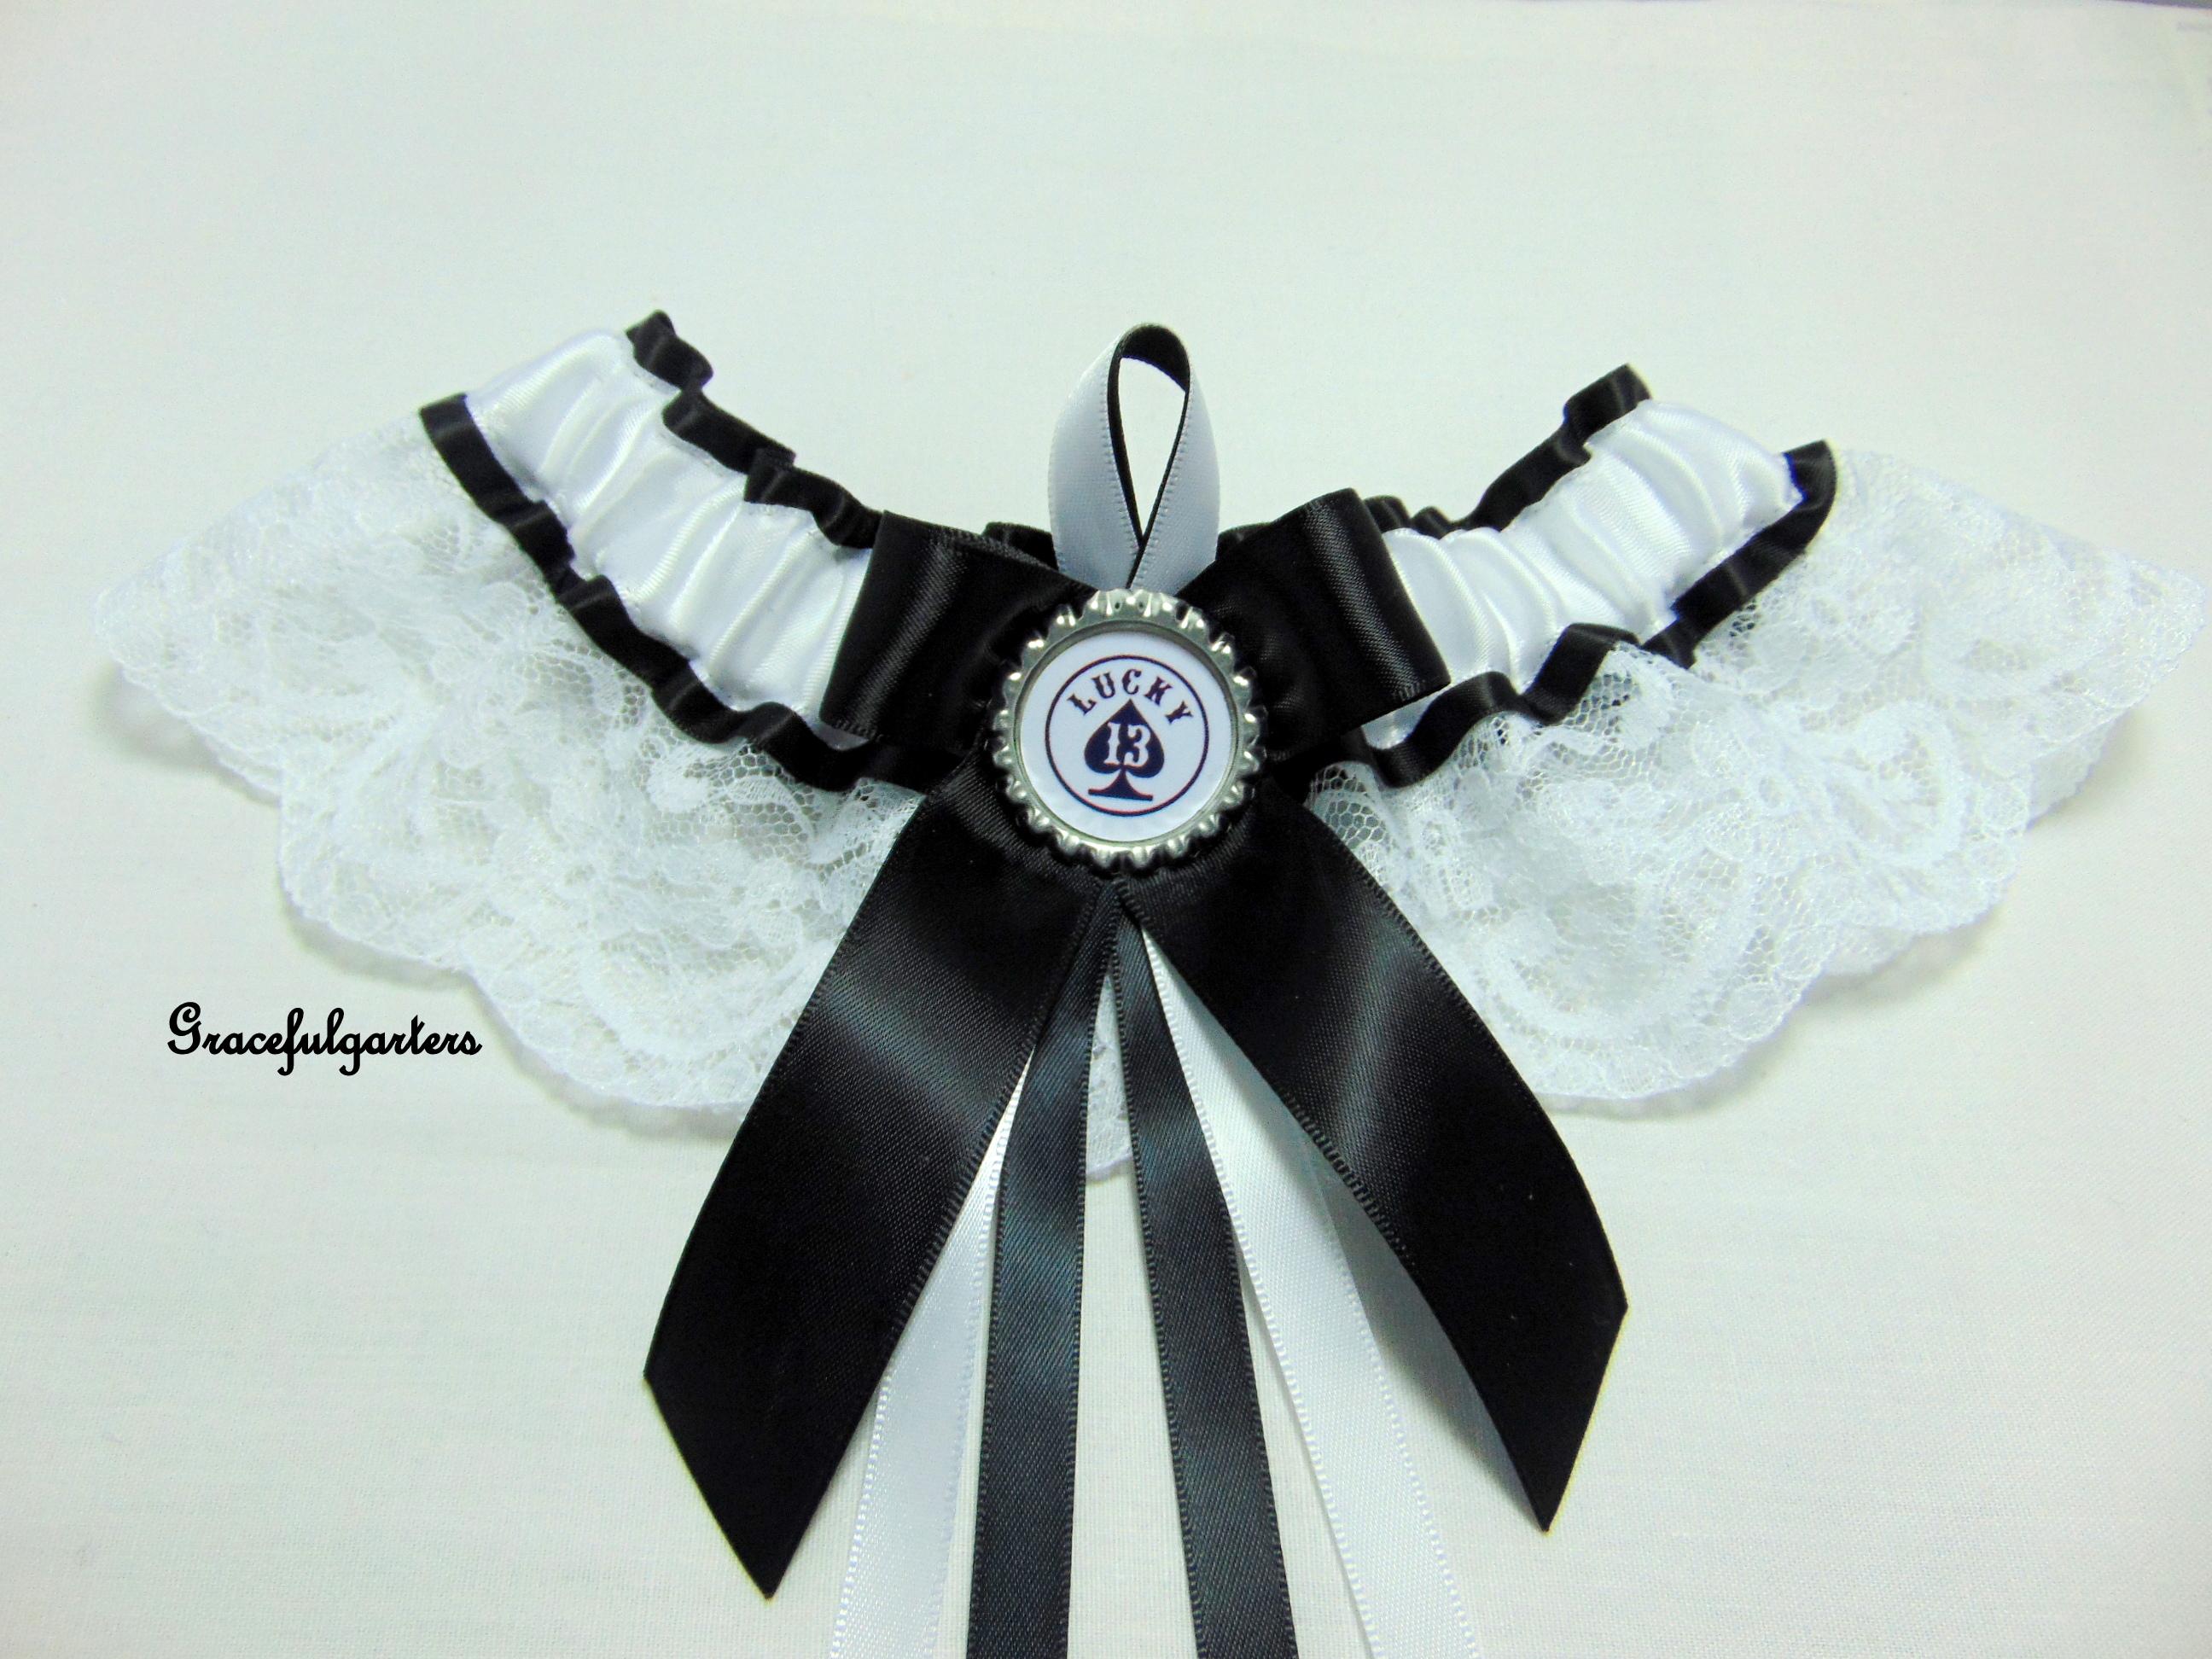 lucky 13 lace bridal wedding garter